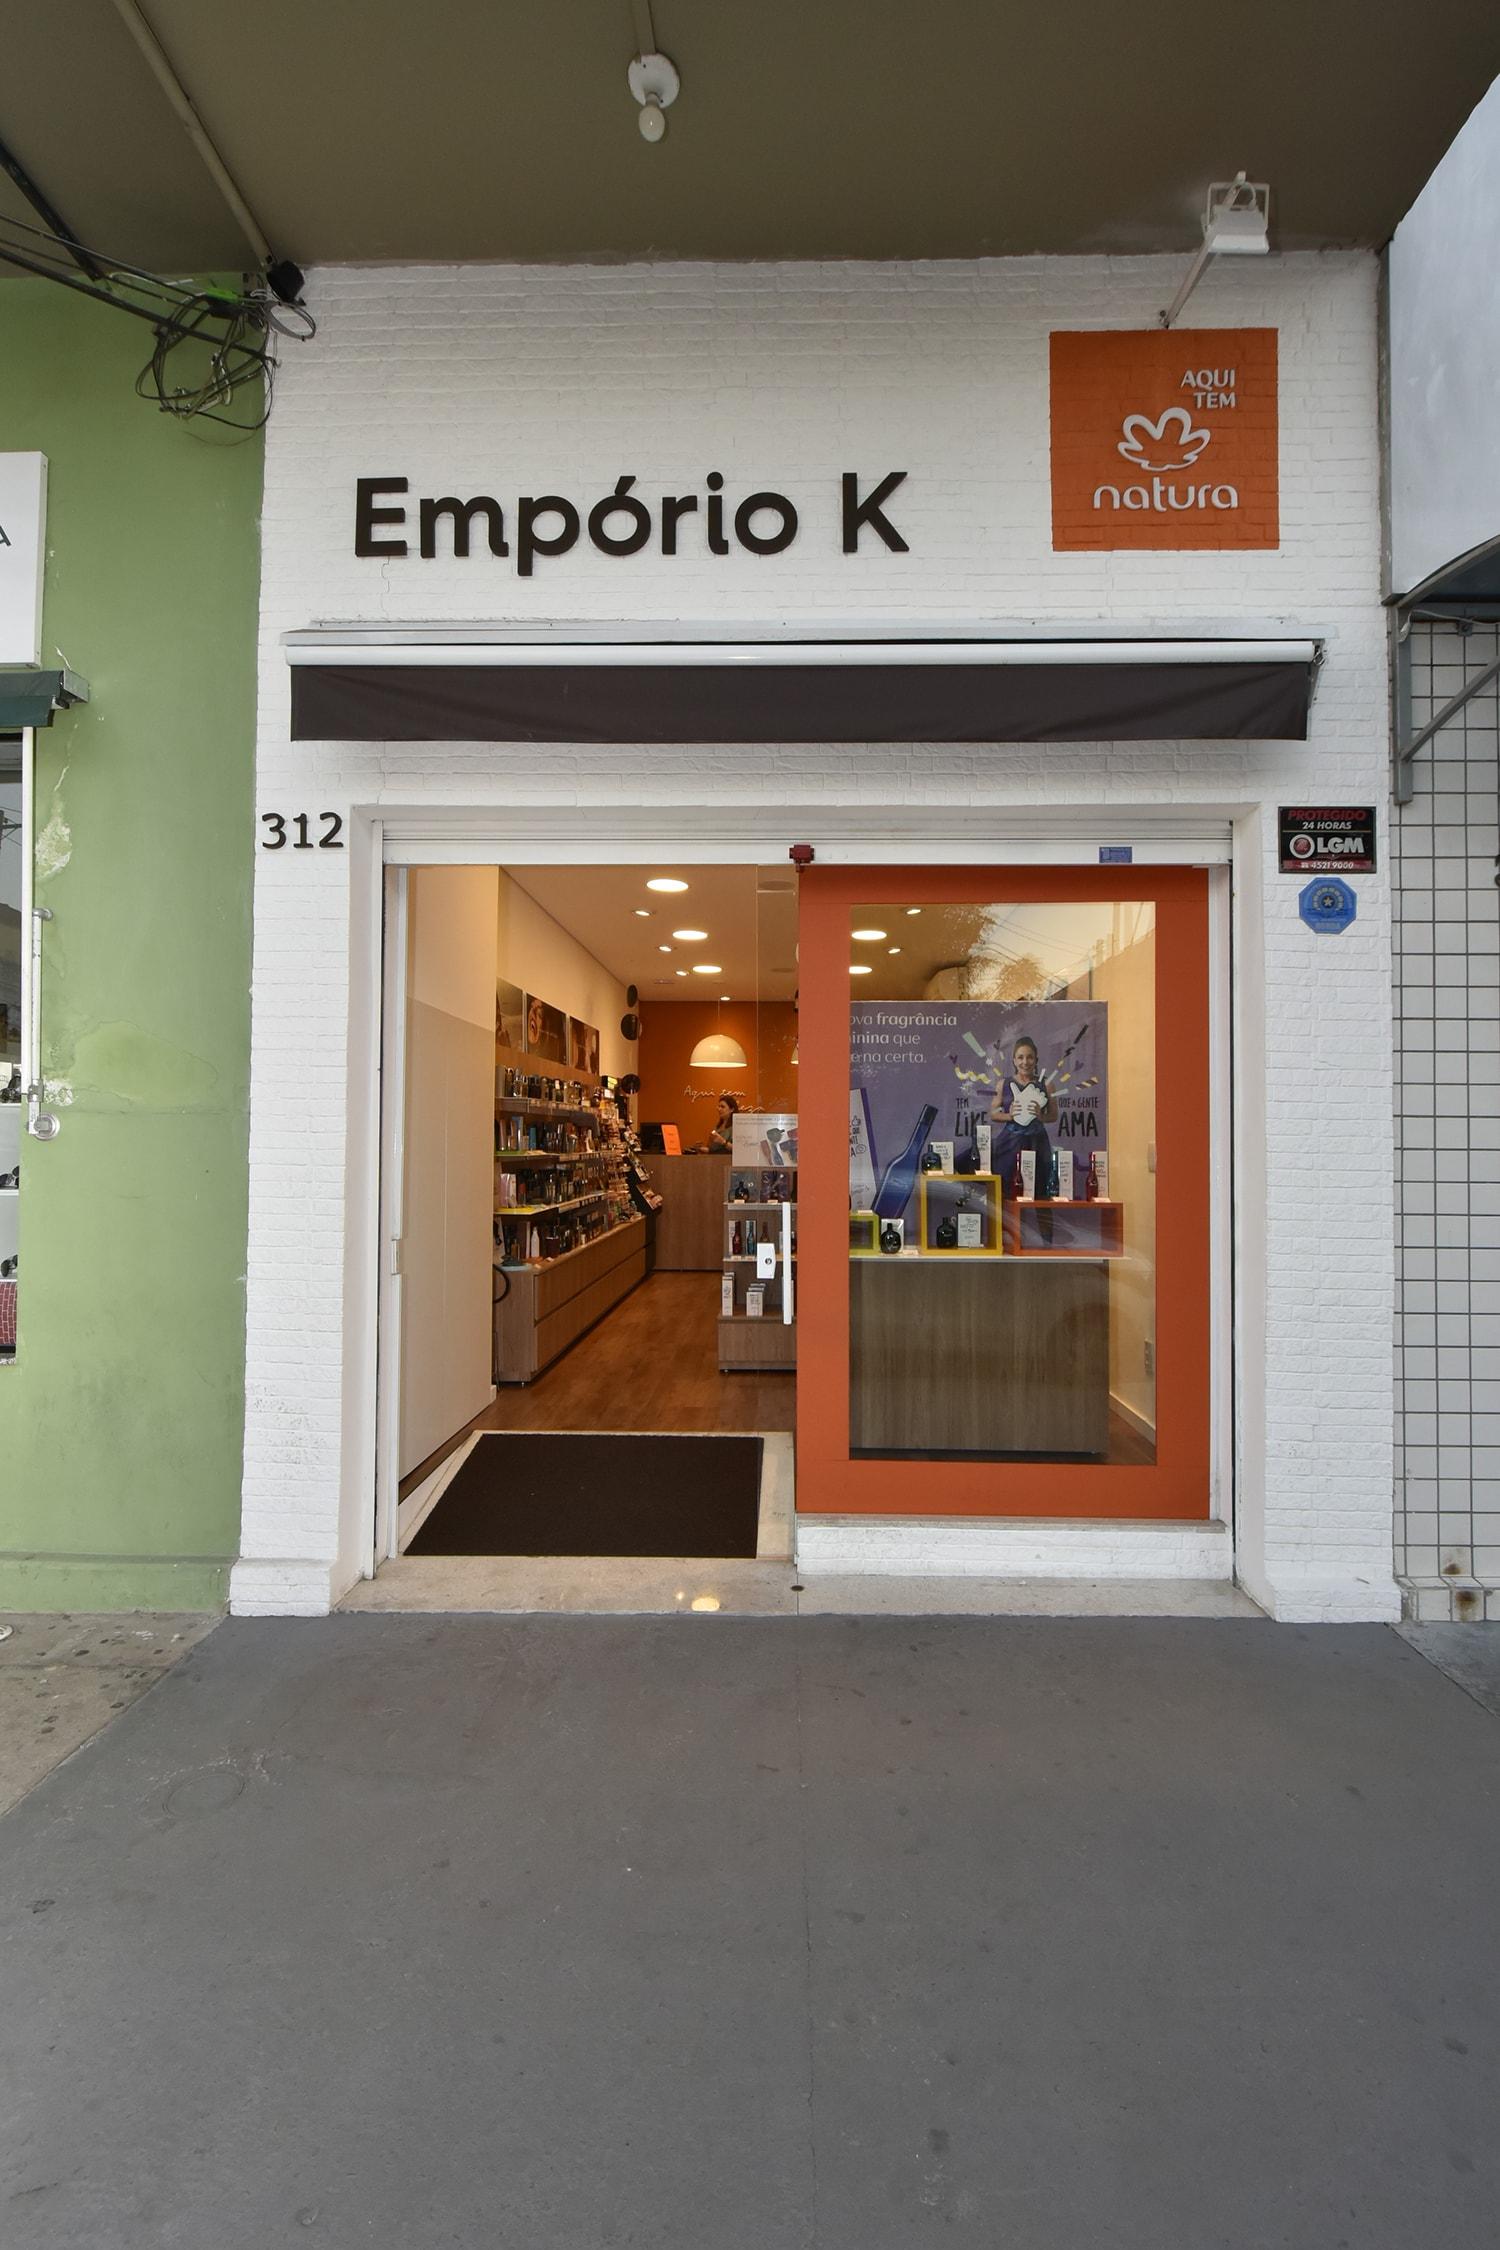 Emporio K Vl Arens (3)-min